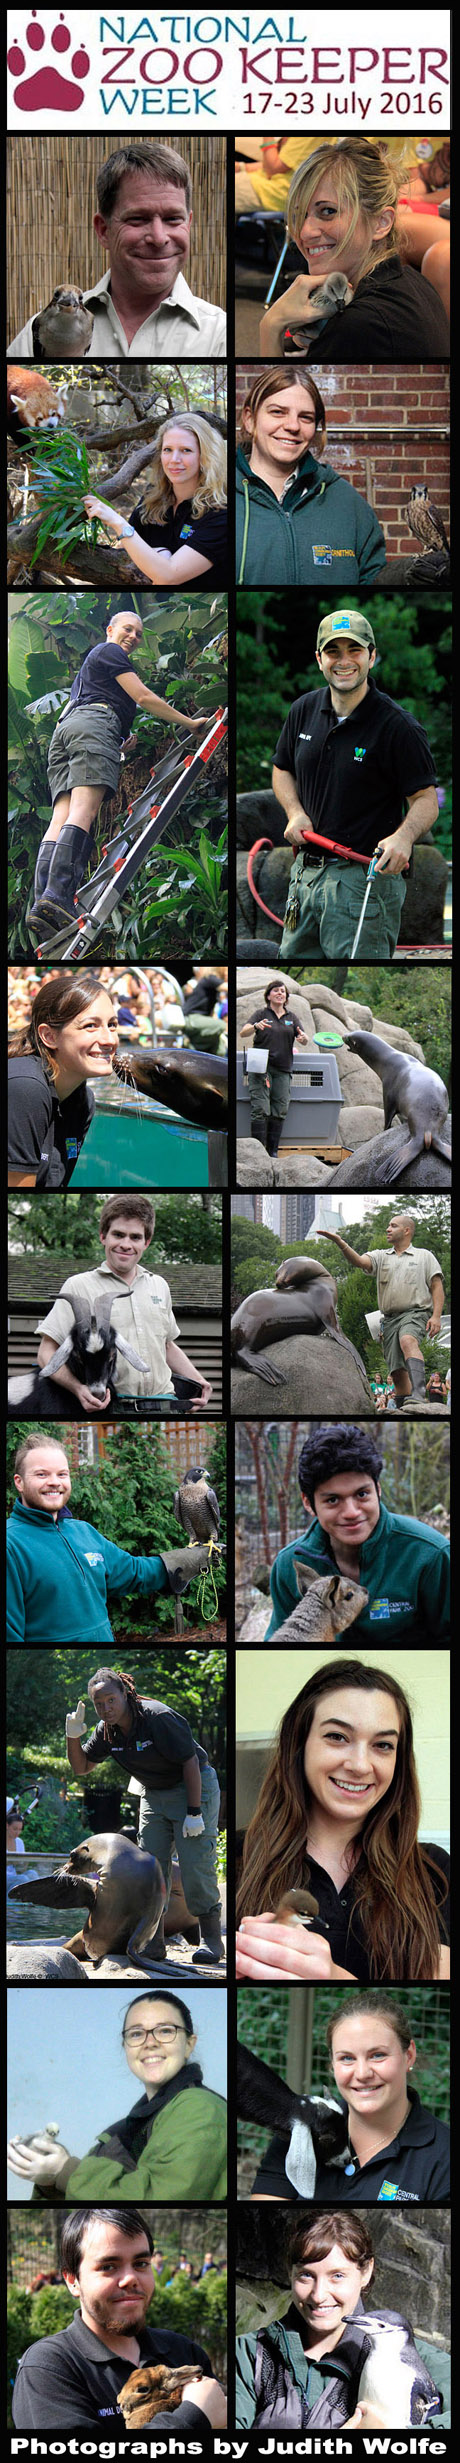 Zoo Keeper Week